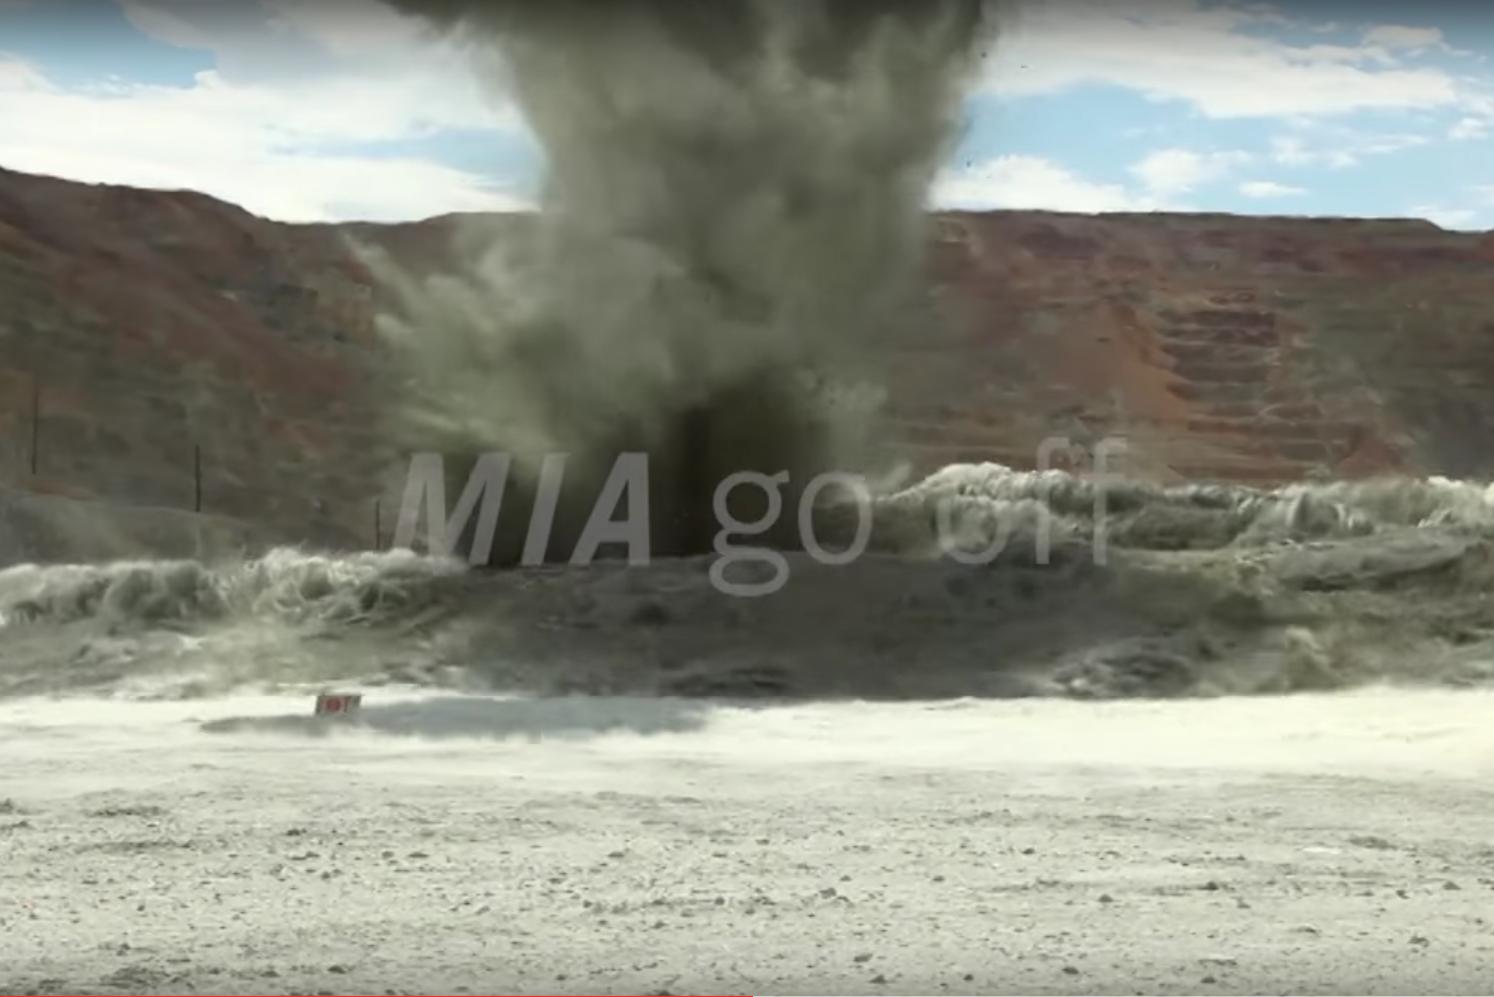 MIA go off explosion video watch